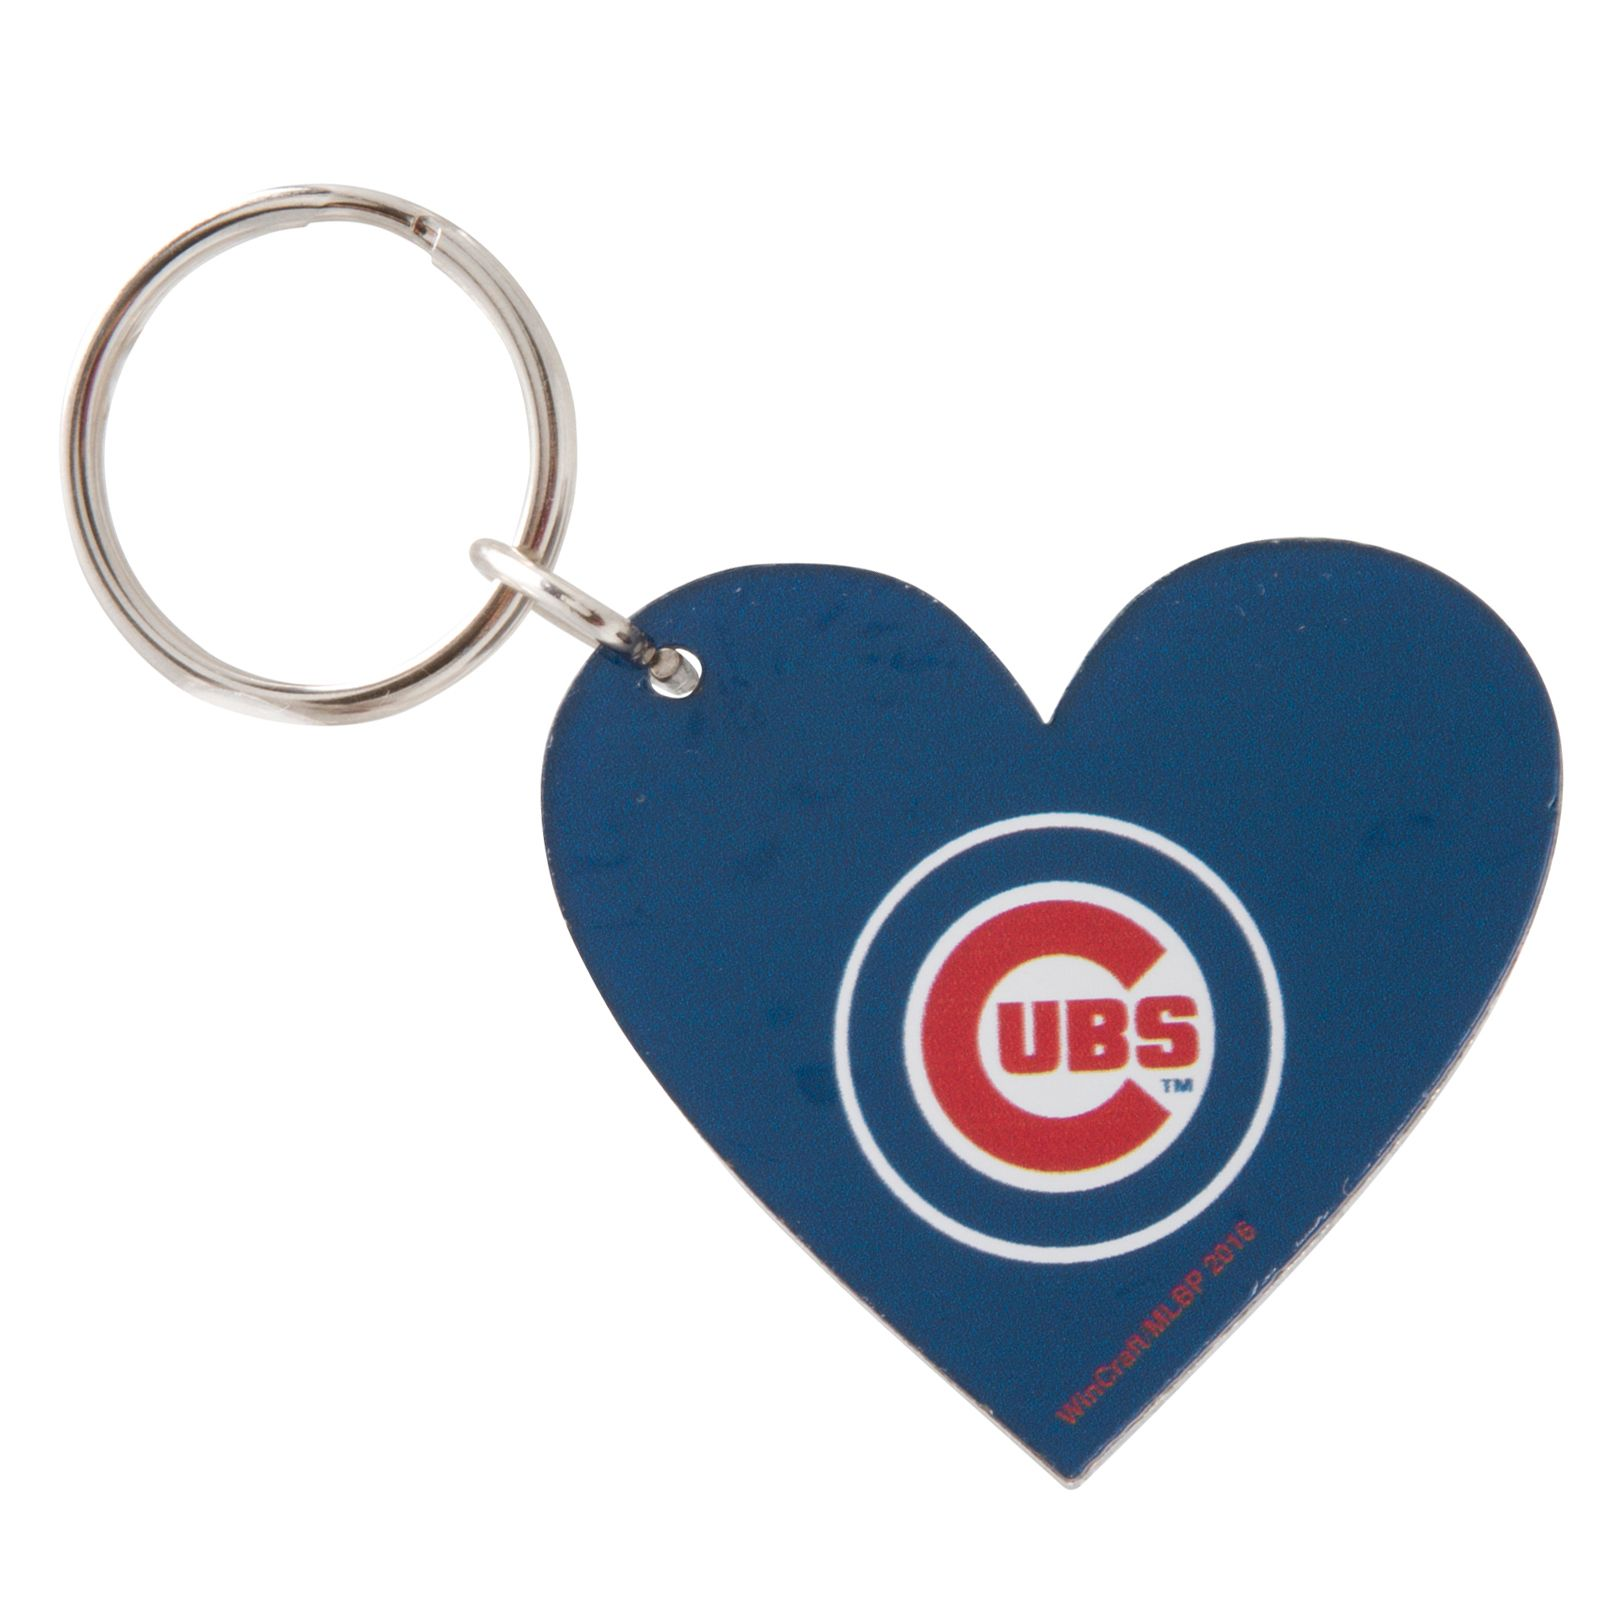 Chicago cubs reflective bullseye logo heart shaped key chain by chicago cubs reflective bullseye logo heart shaped key chain by wincraft chicago chicagocubs cubs altavistaventures Image collections